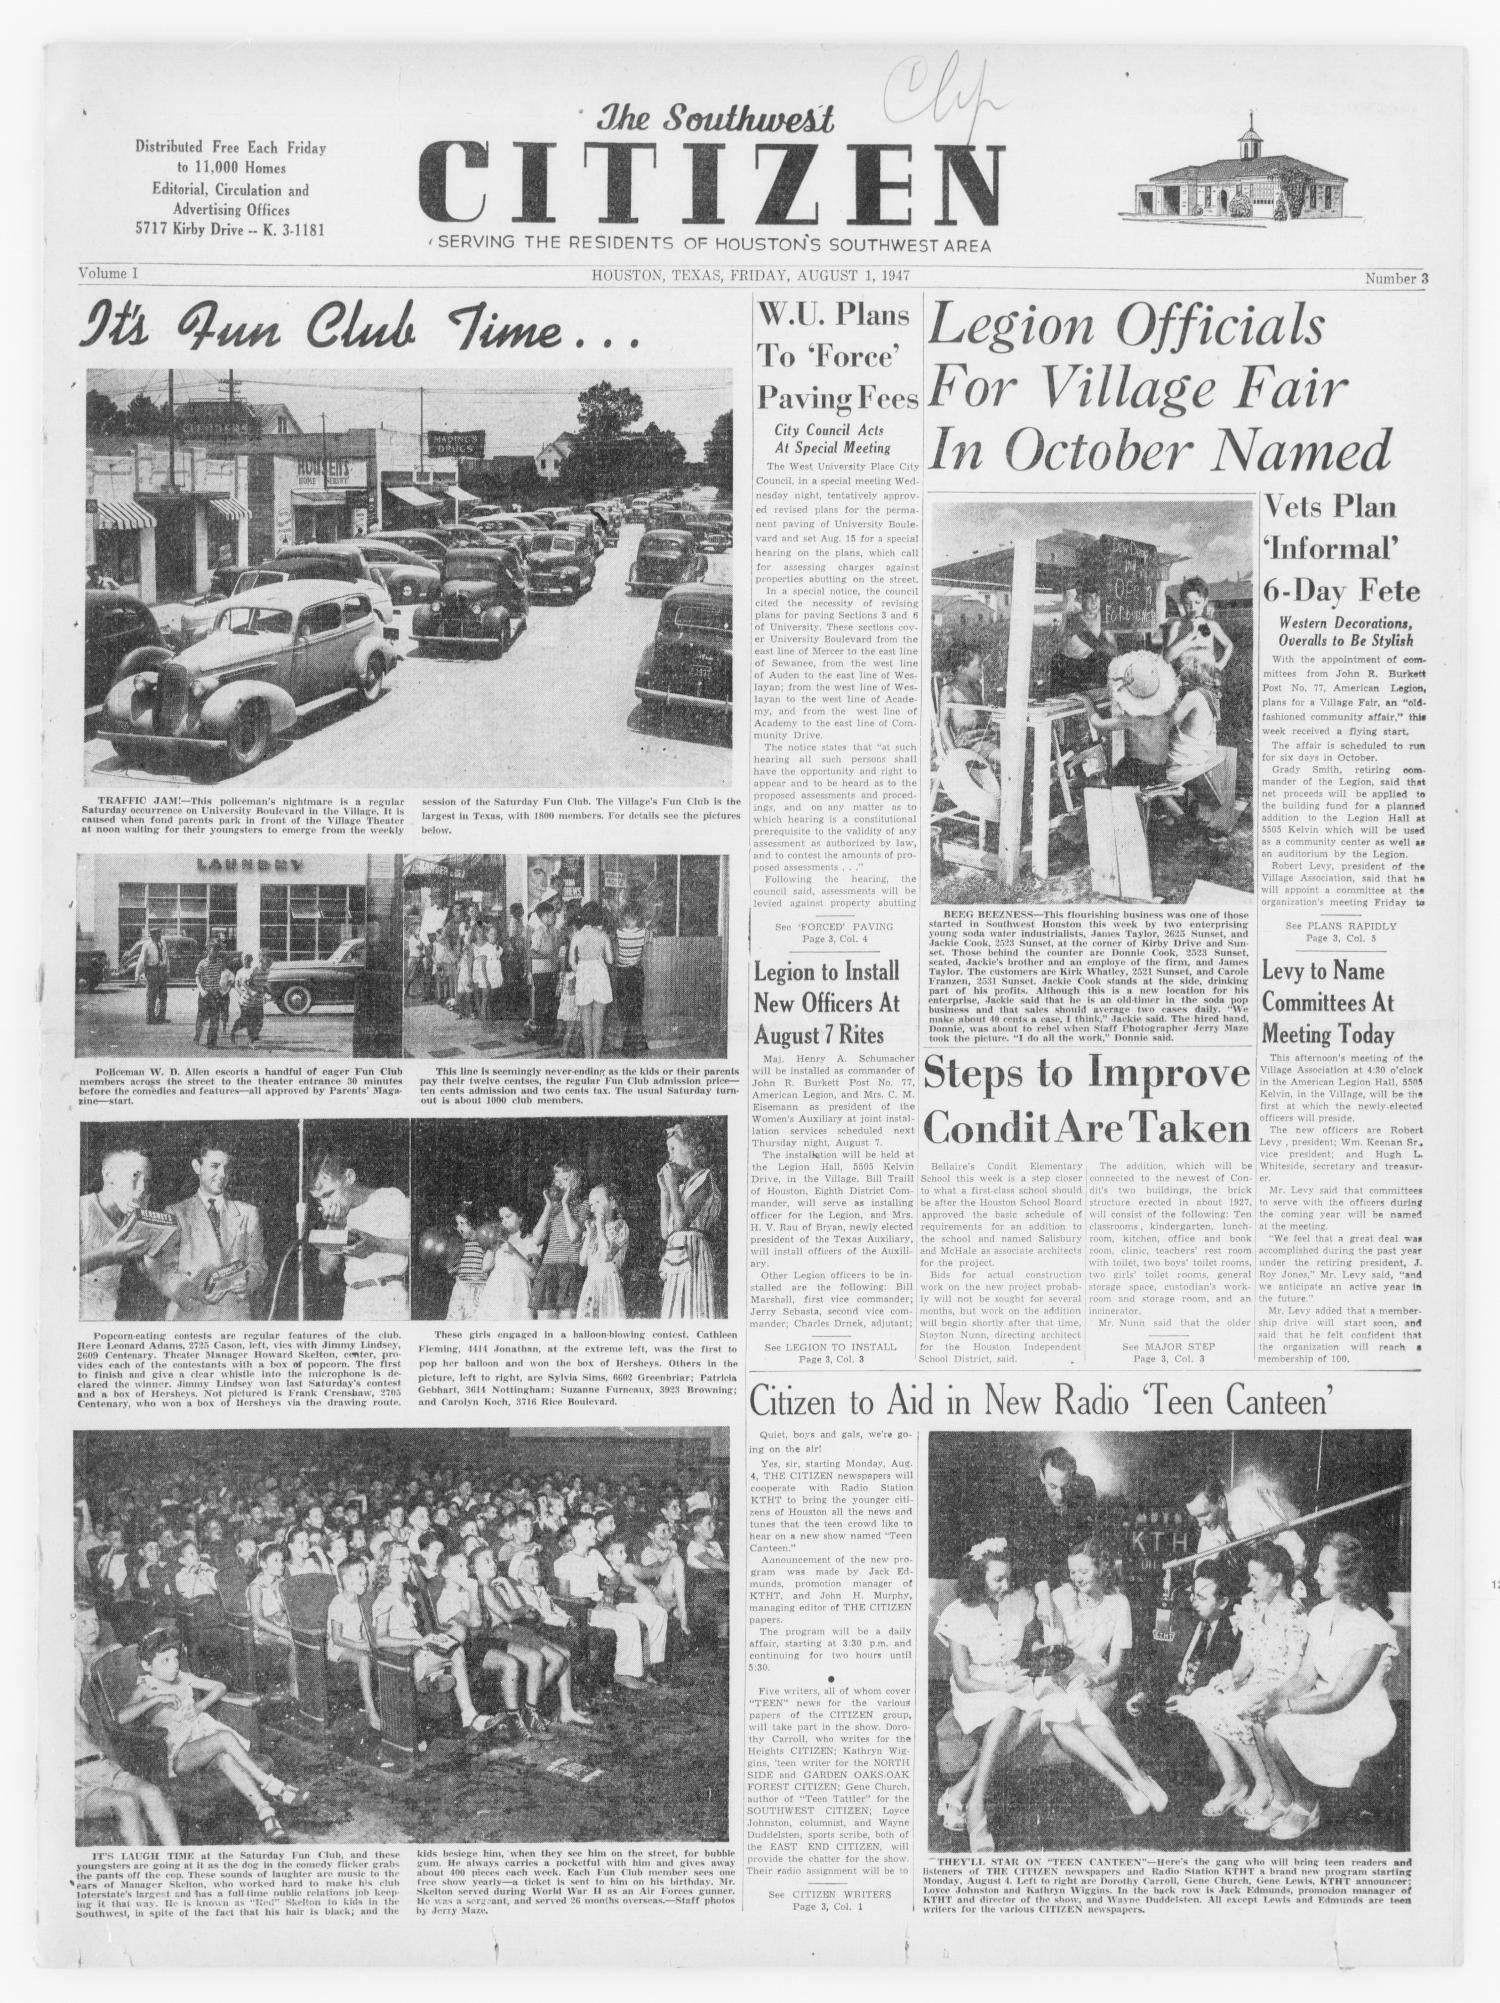 The Southwest Citizen (Houston, Tex ), Vol  1, No  3, Ed  1